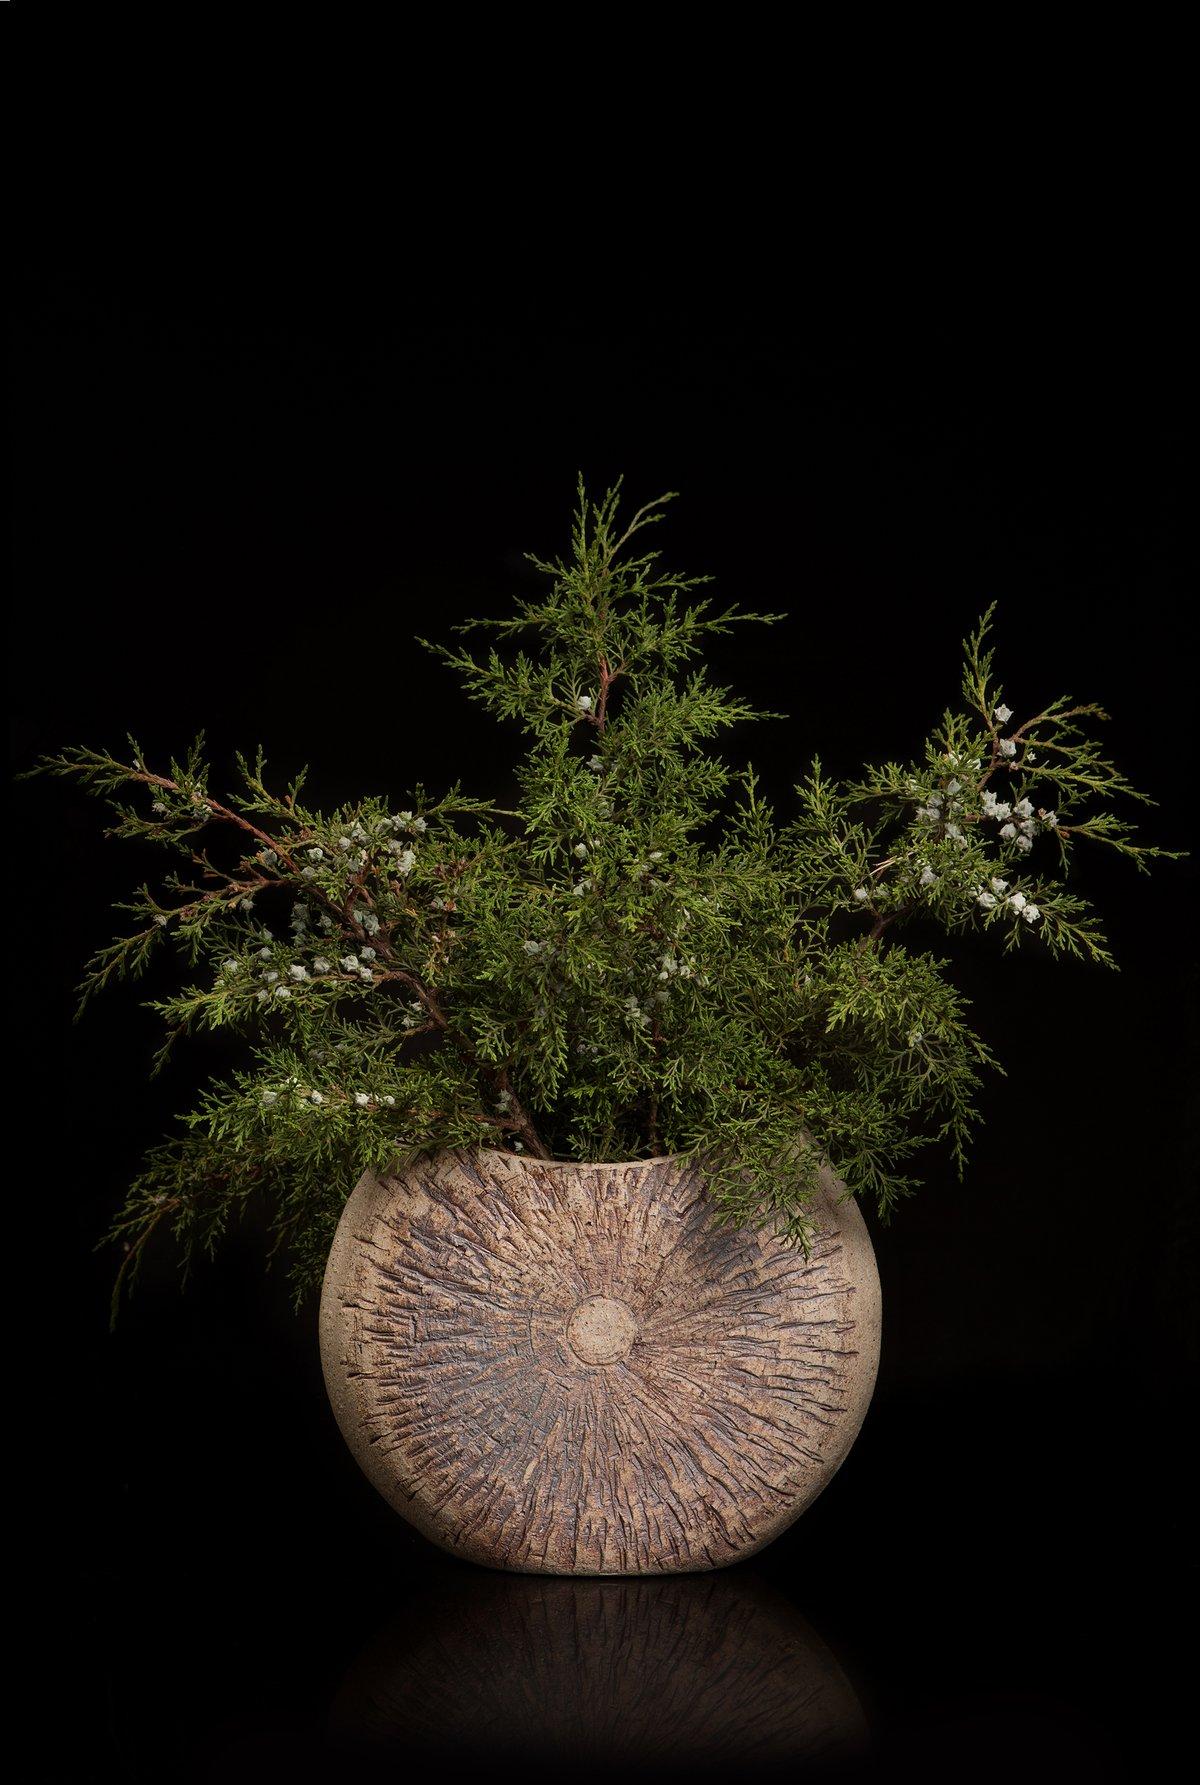 Woodland sill vase